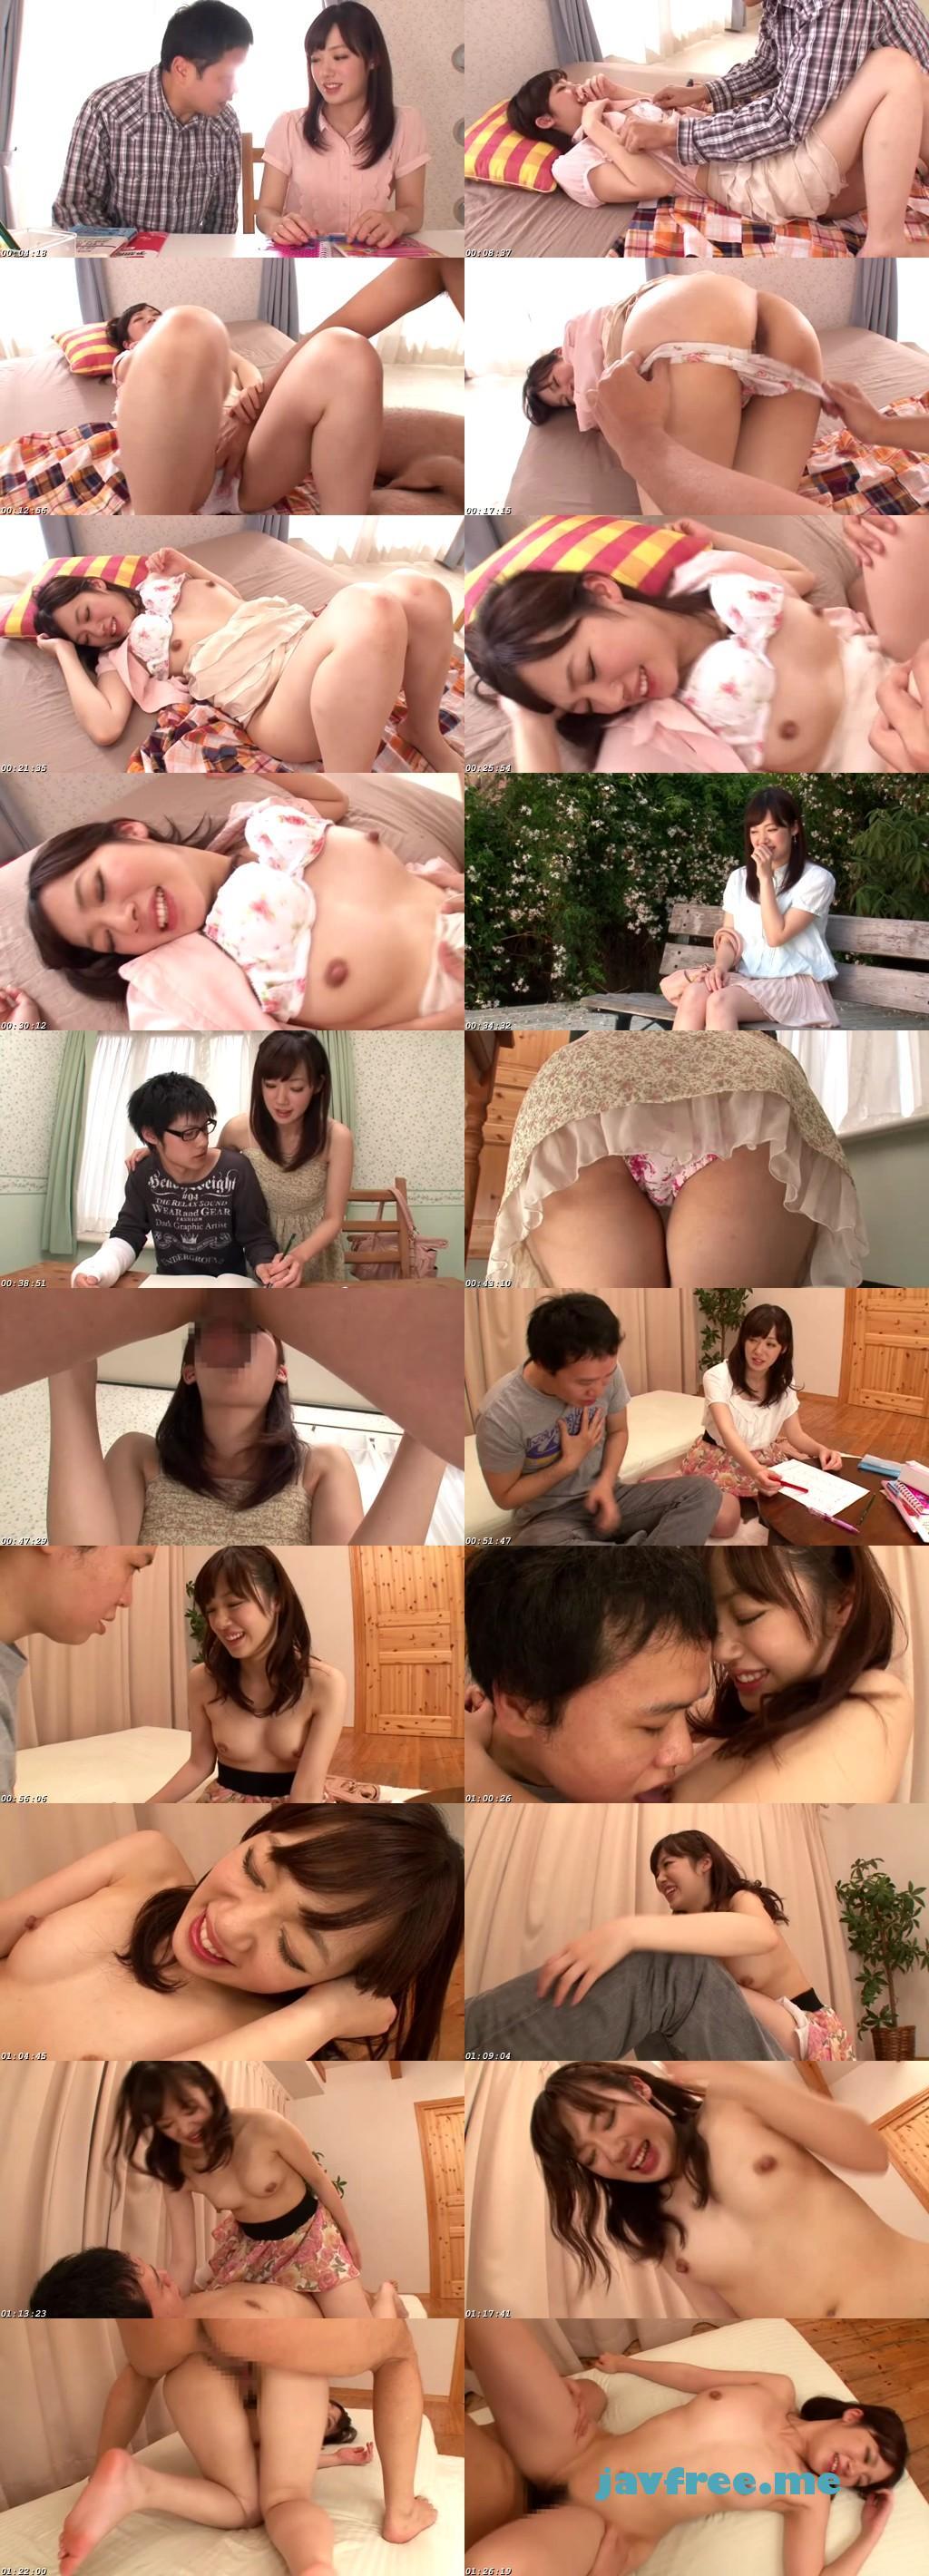 [MIDD 908] 現役女子大生 押しに弱い家庭教師 大島里奈 大島里奈 MIDD